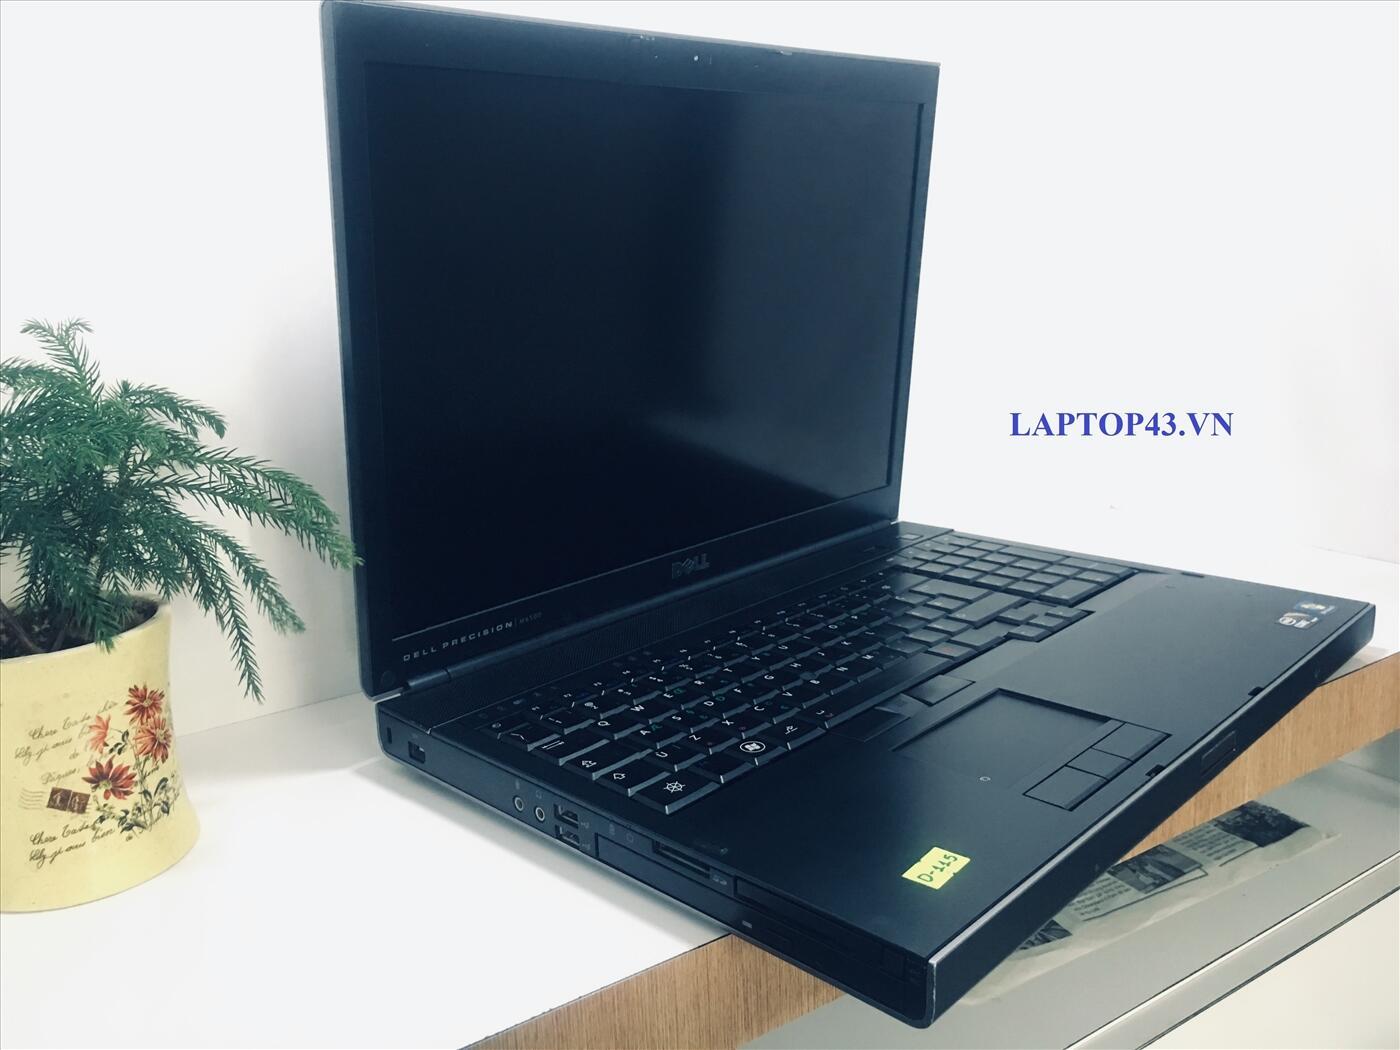 Dell Precision M6500 Core i7 X940~2.13Ghz Ram 4G HDD 1TB 17.3